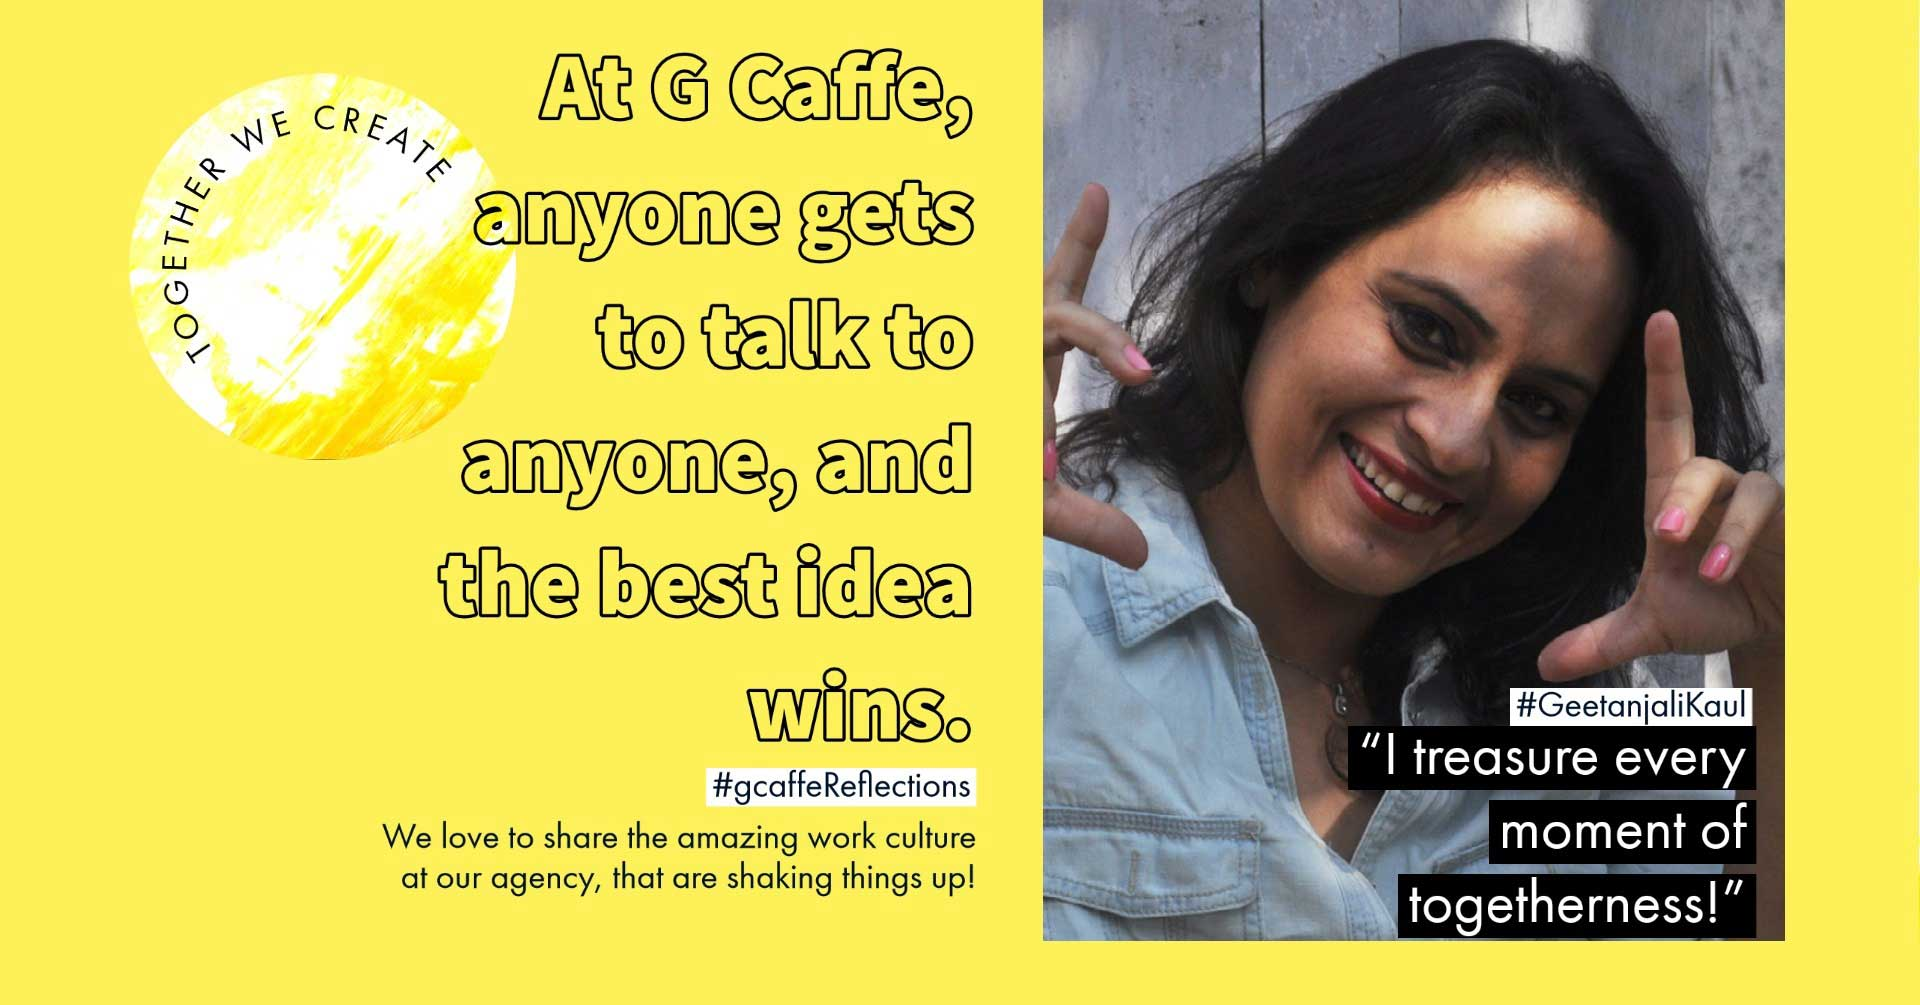 G Caffe creative agency company culture